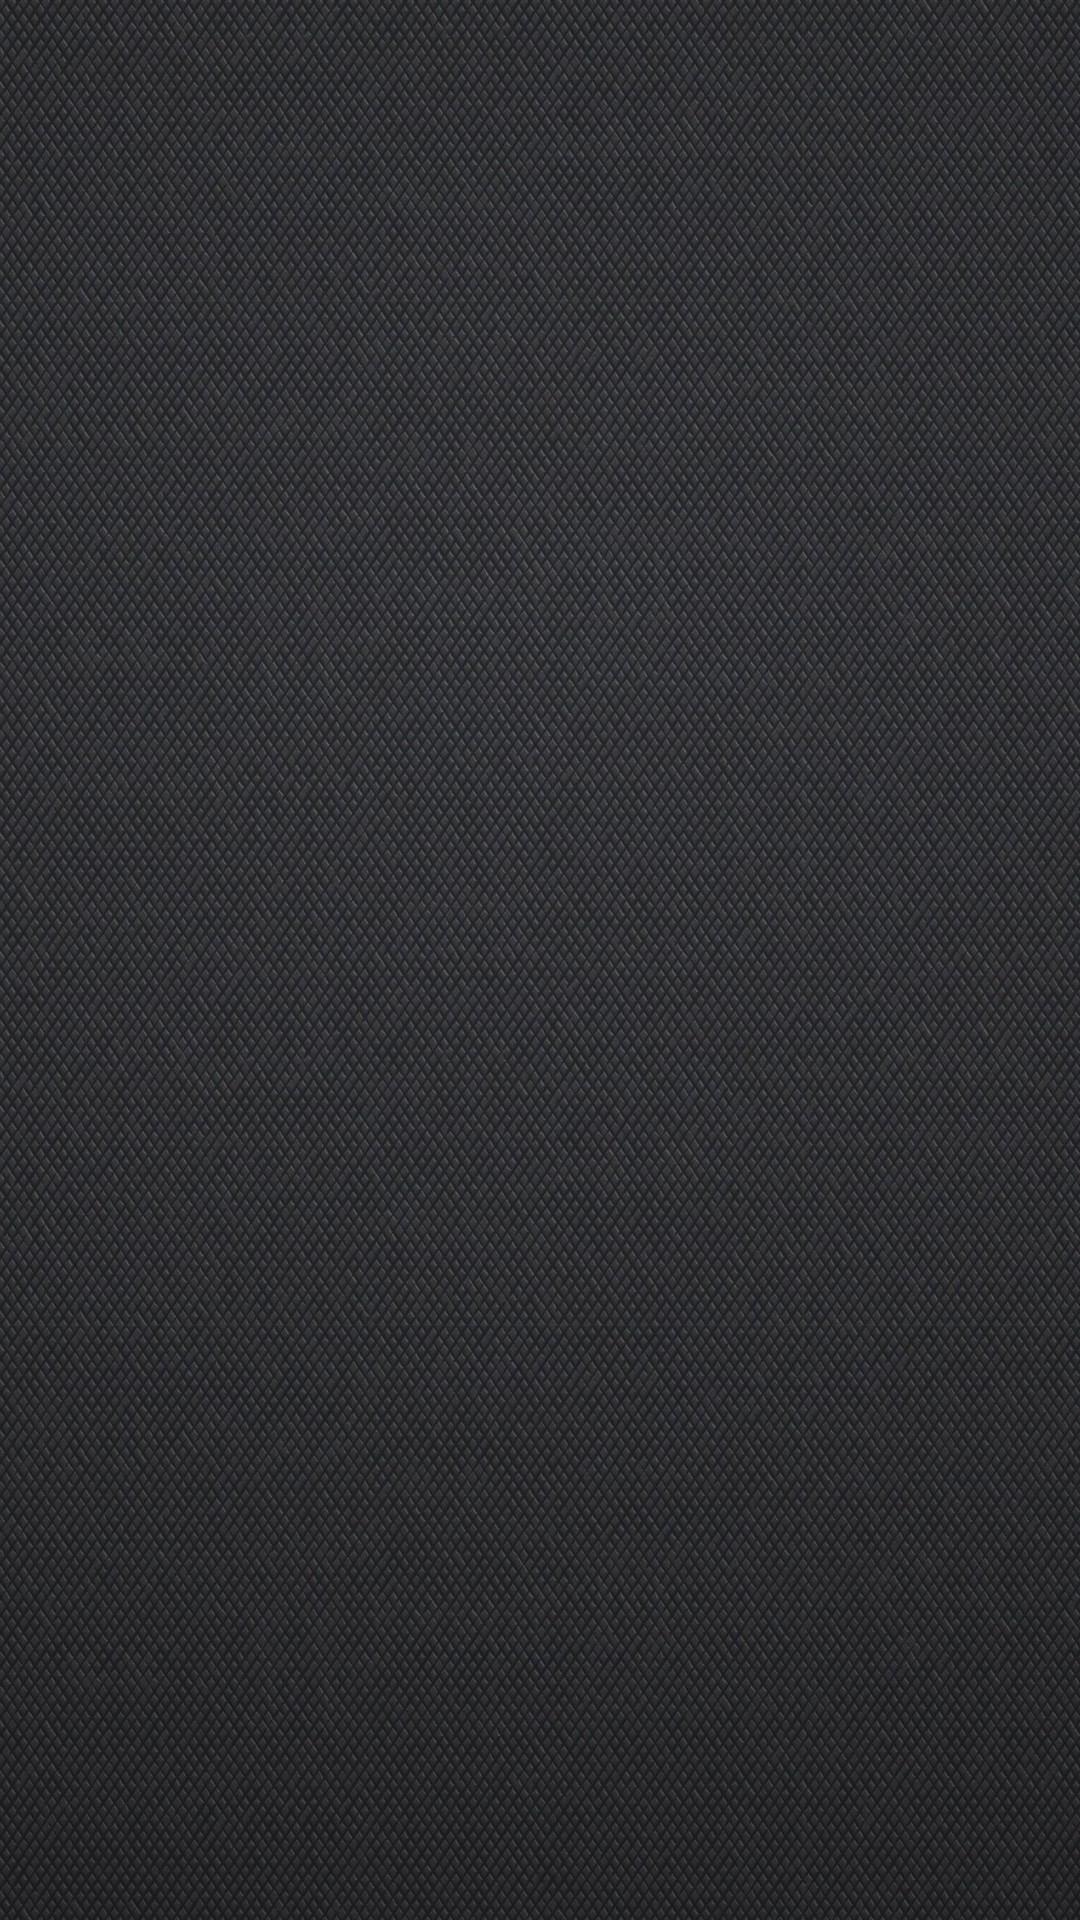 iPhone 6 Plus Wallpaper Dark Pattern 04 iPhone 6 Wallpapers 1080x1920